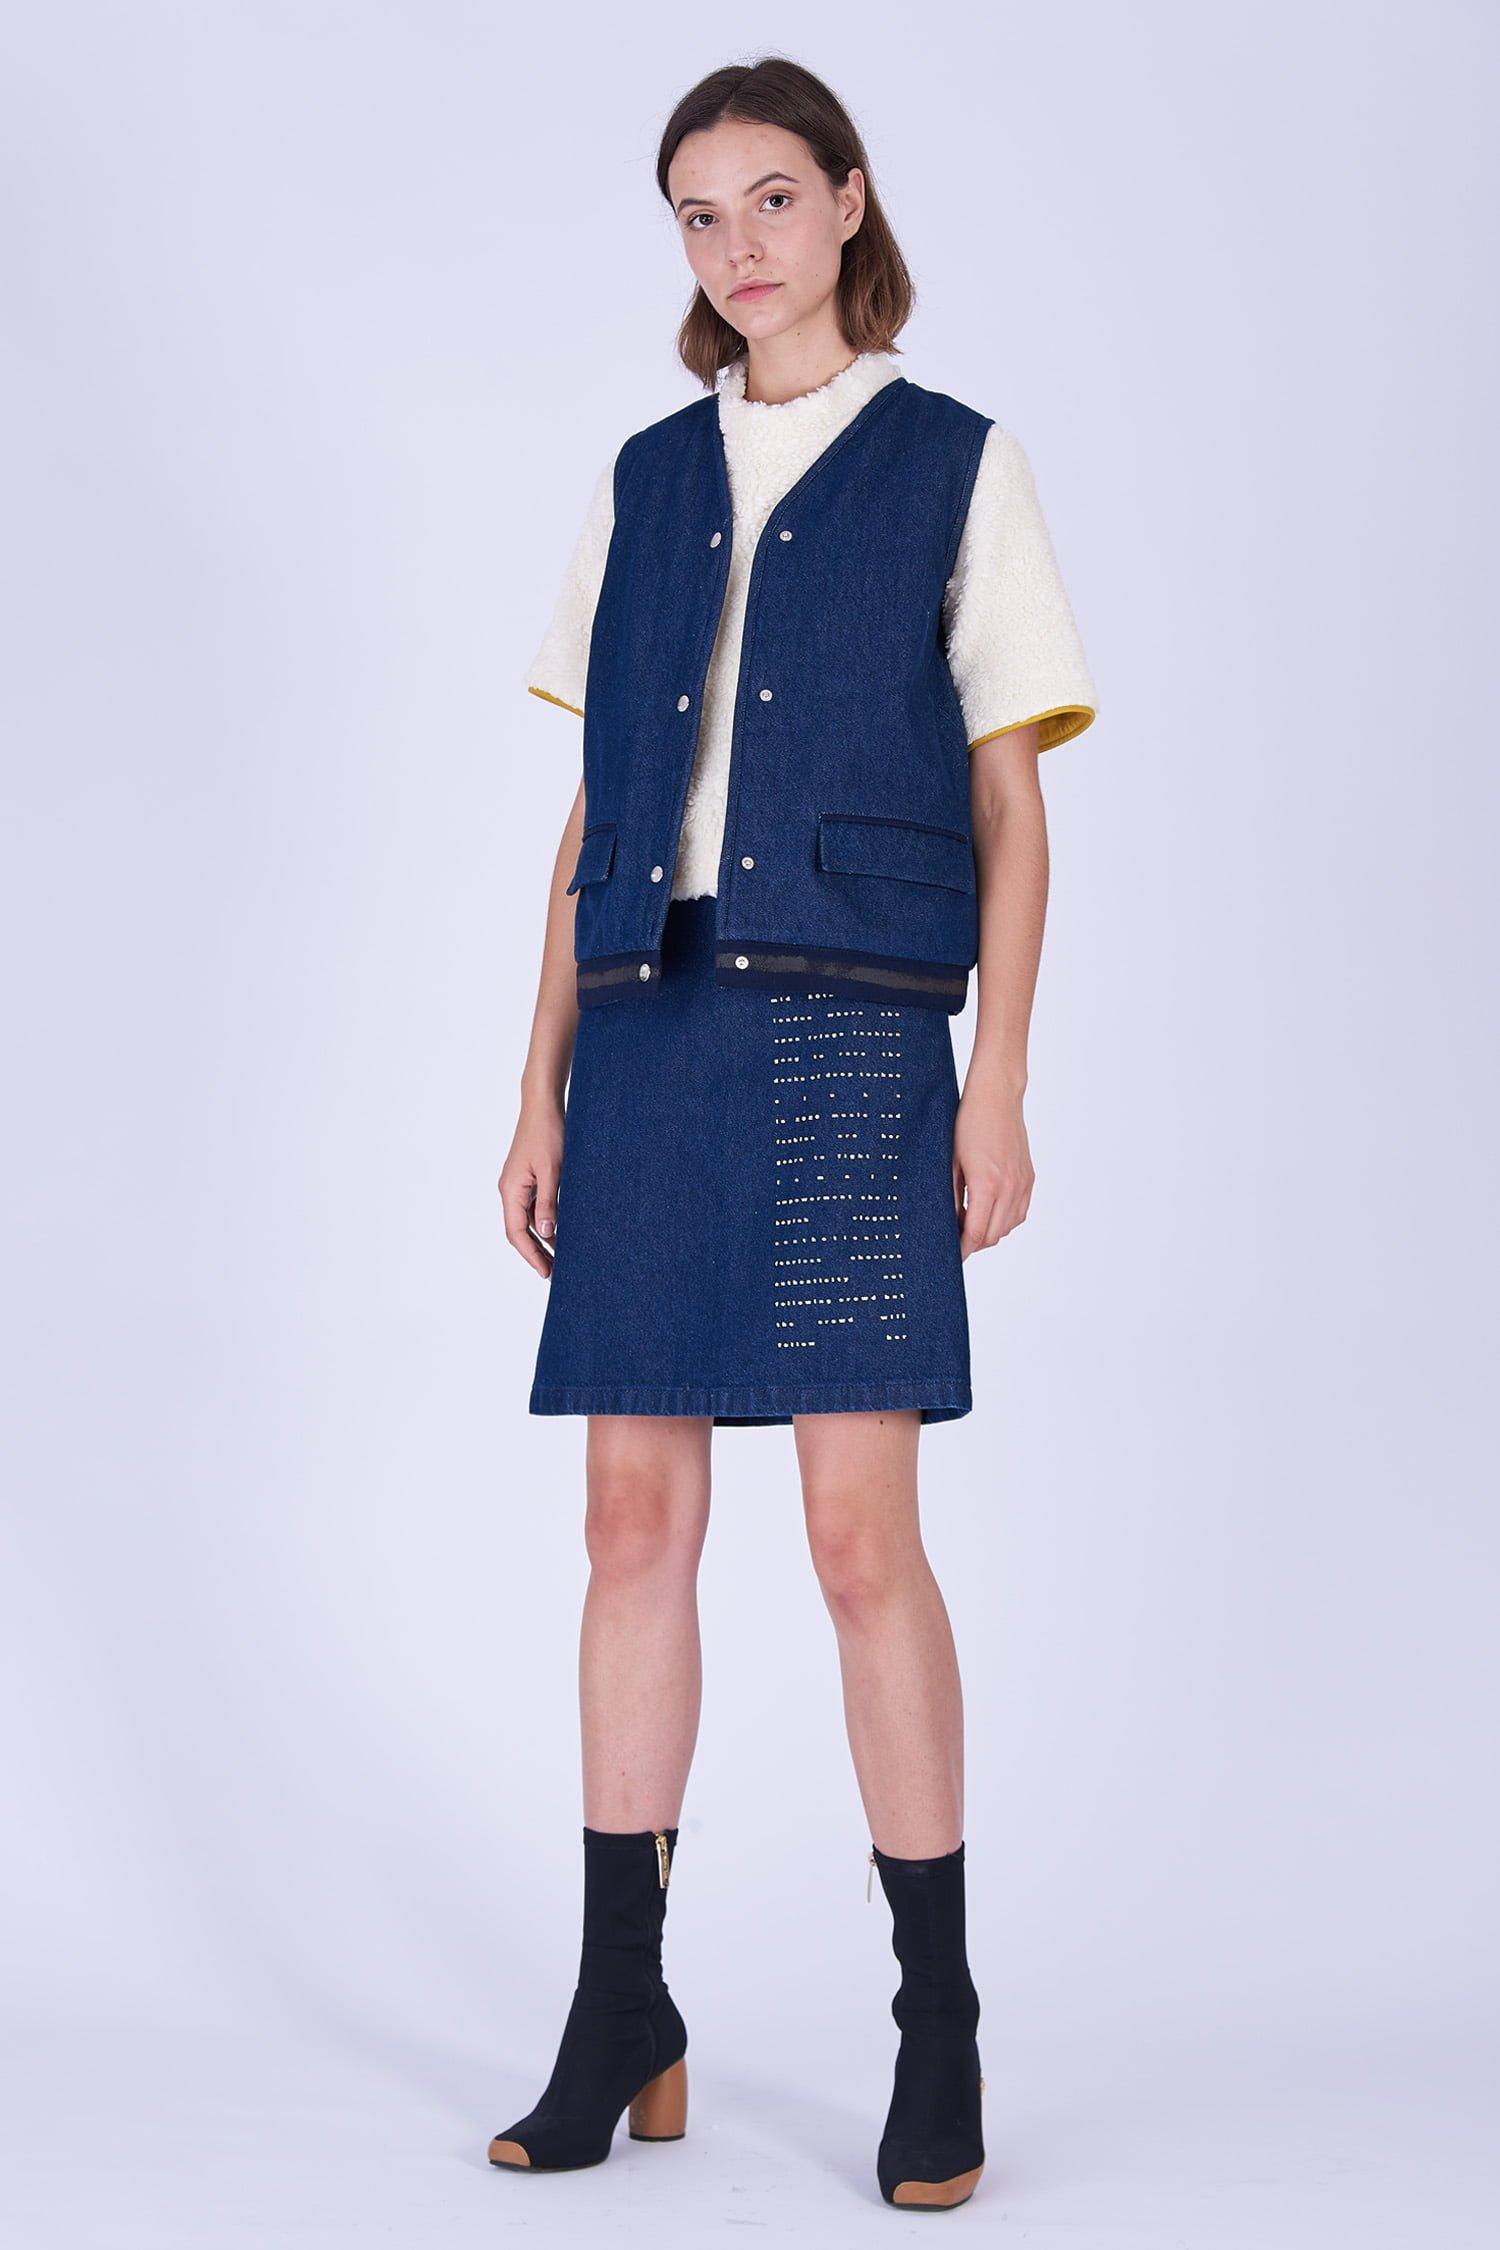 Acephala Fw19 20 Denim Vest Fleece Spodnica Denim Print Kamizelka Jeans Baranek Spodnica Jeans Nadruk Front 1